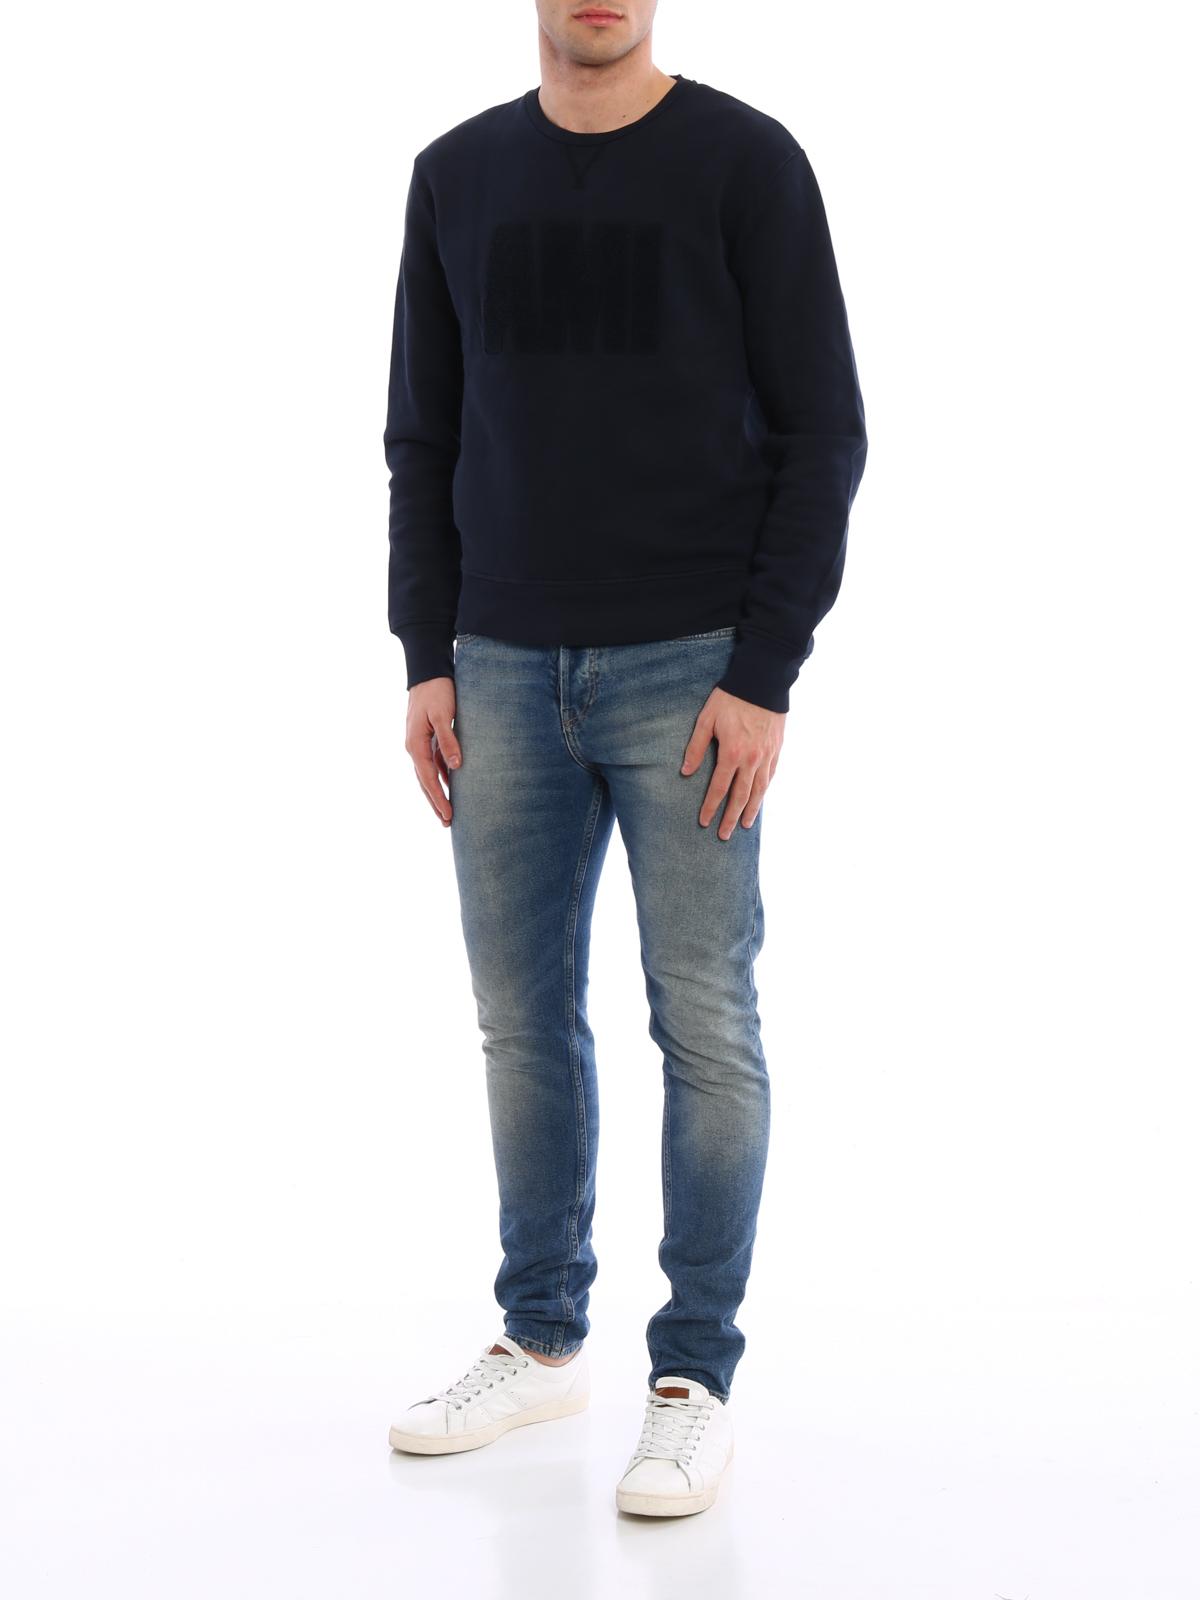 Online sweatshirt shopping